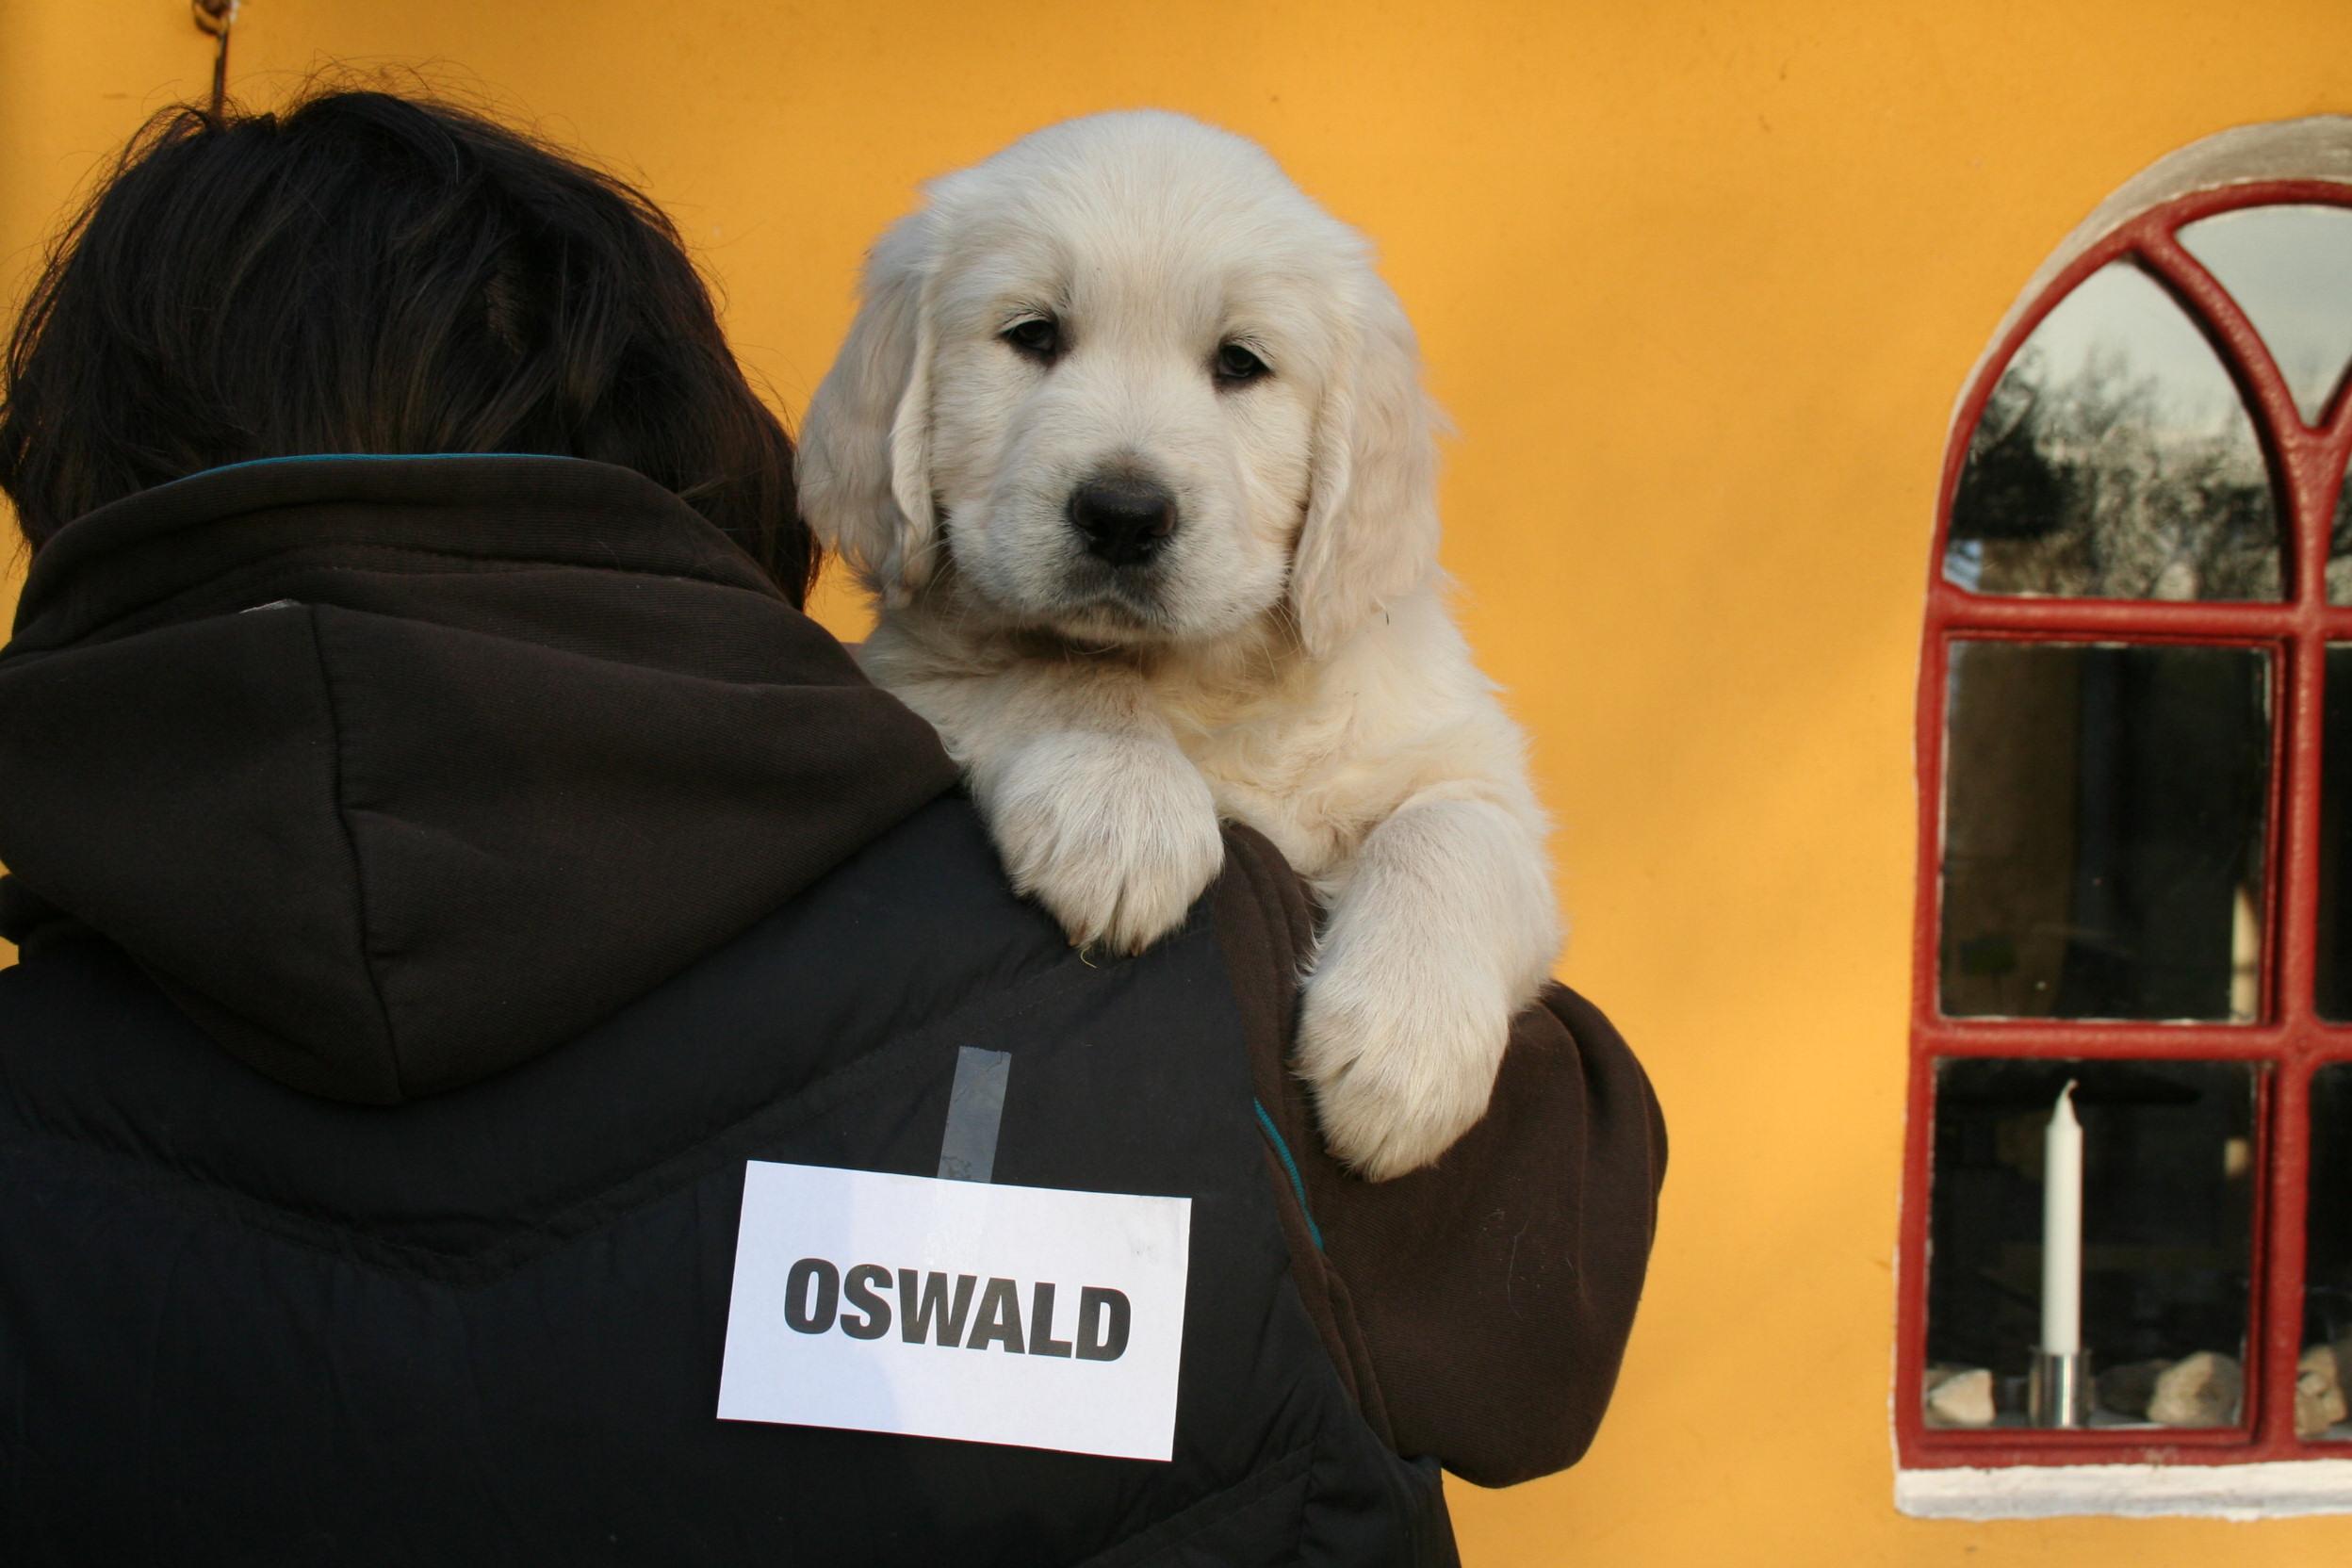 OSWALD (Kermit)